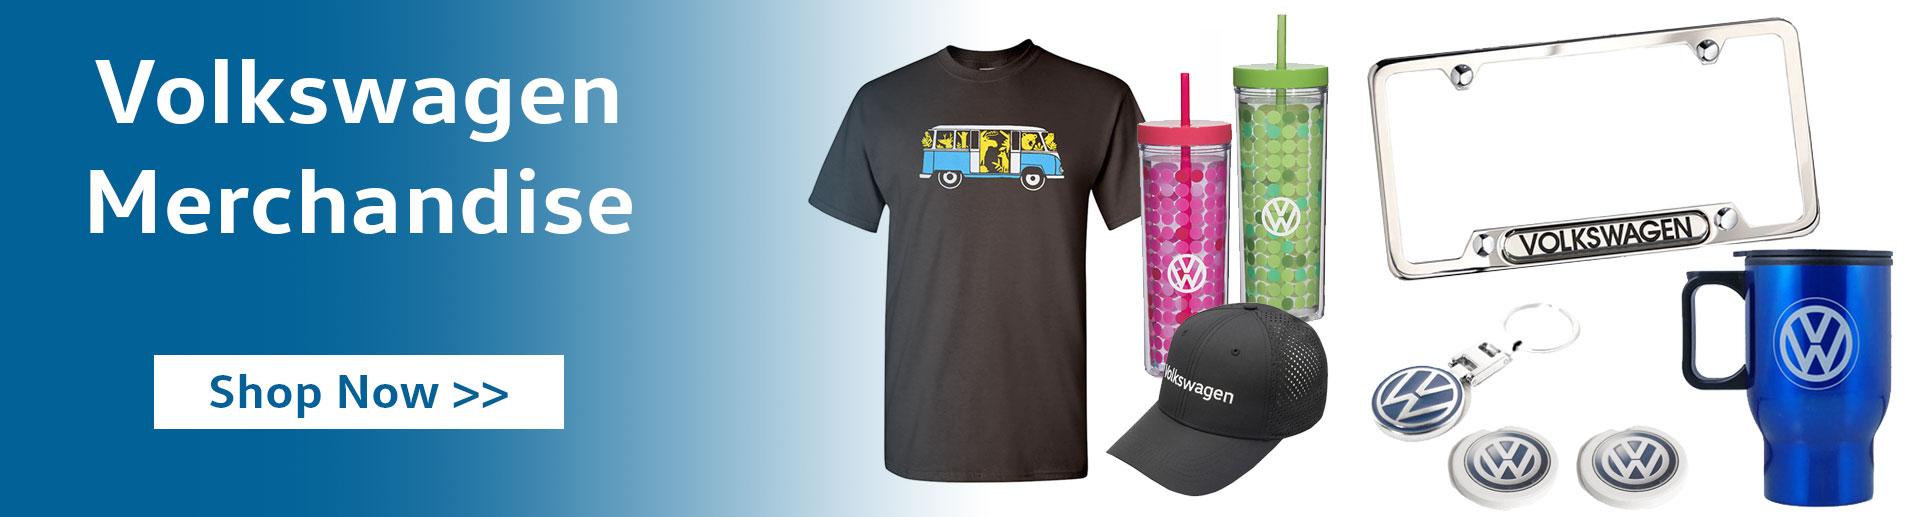 VW Merchandise